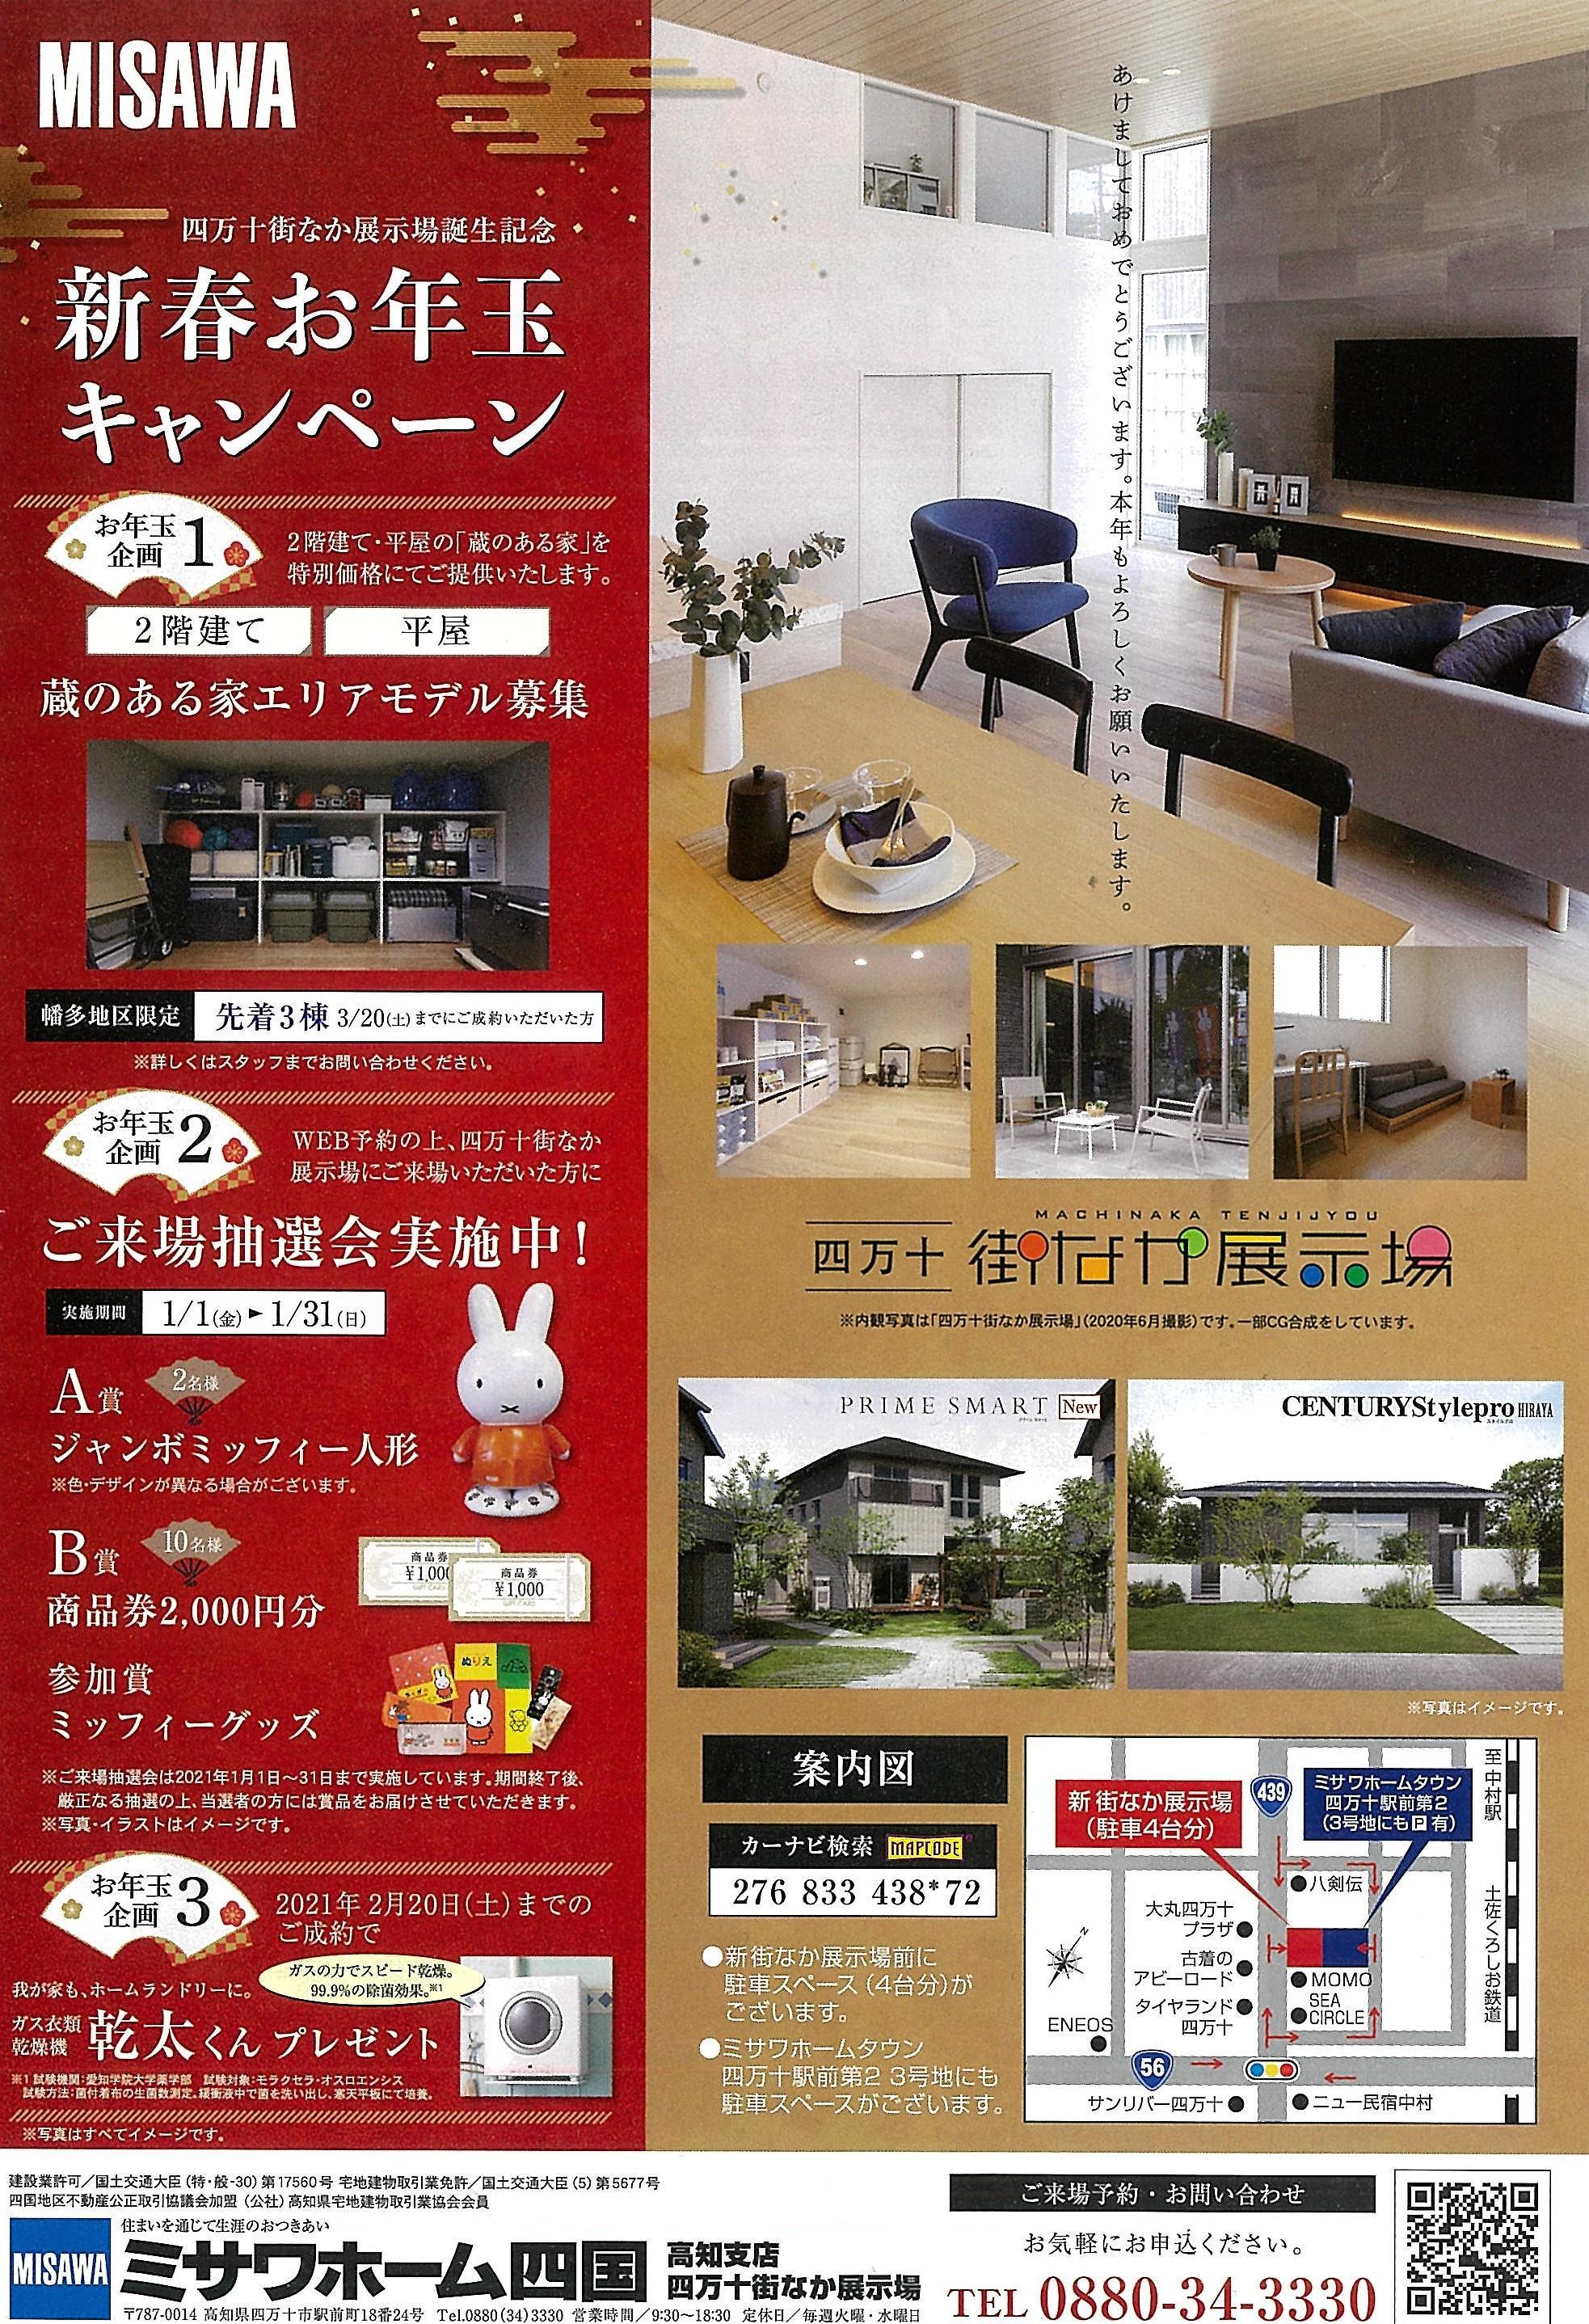 https://shikoku.misawa.co.jp/area_kouchi/20210305125359.jpg